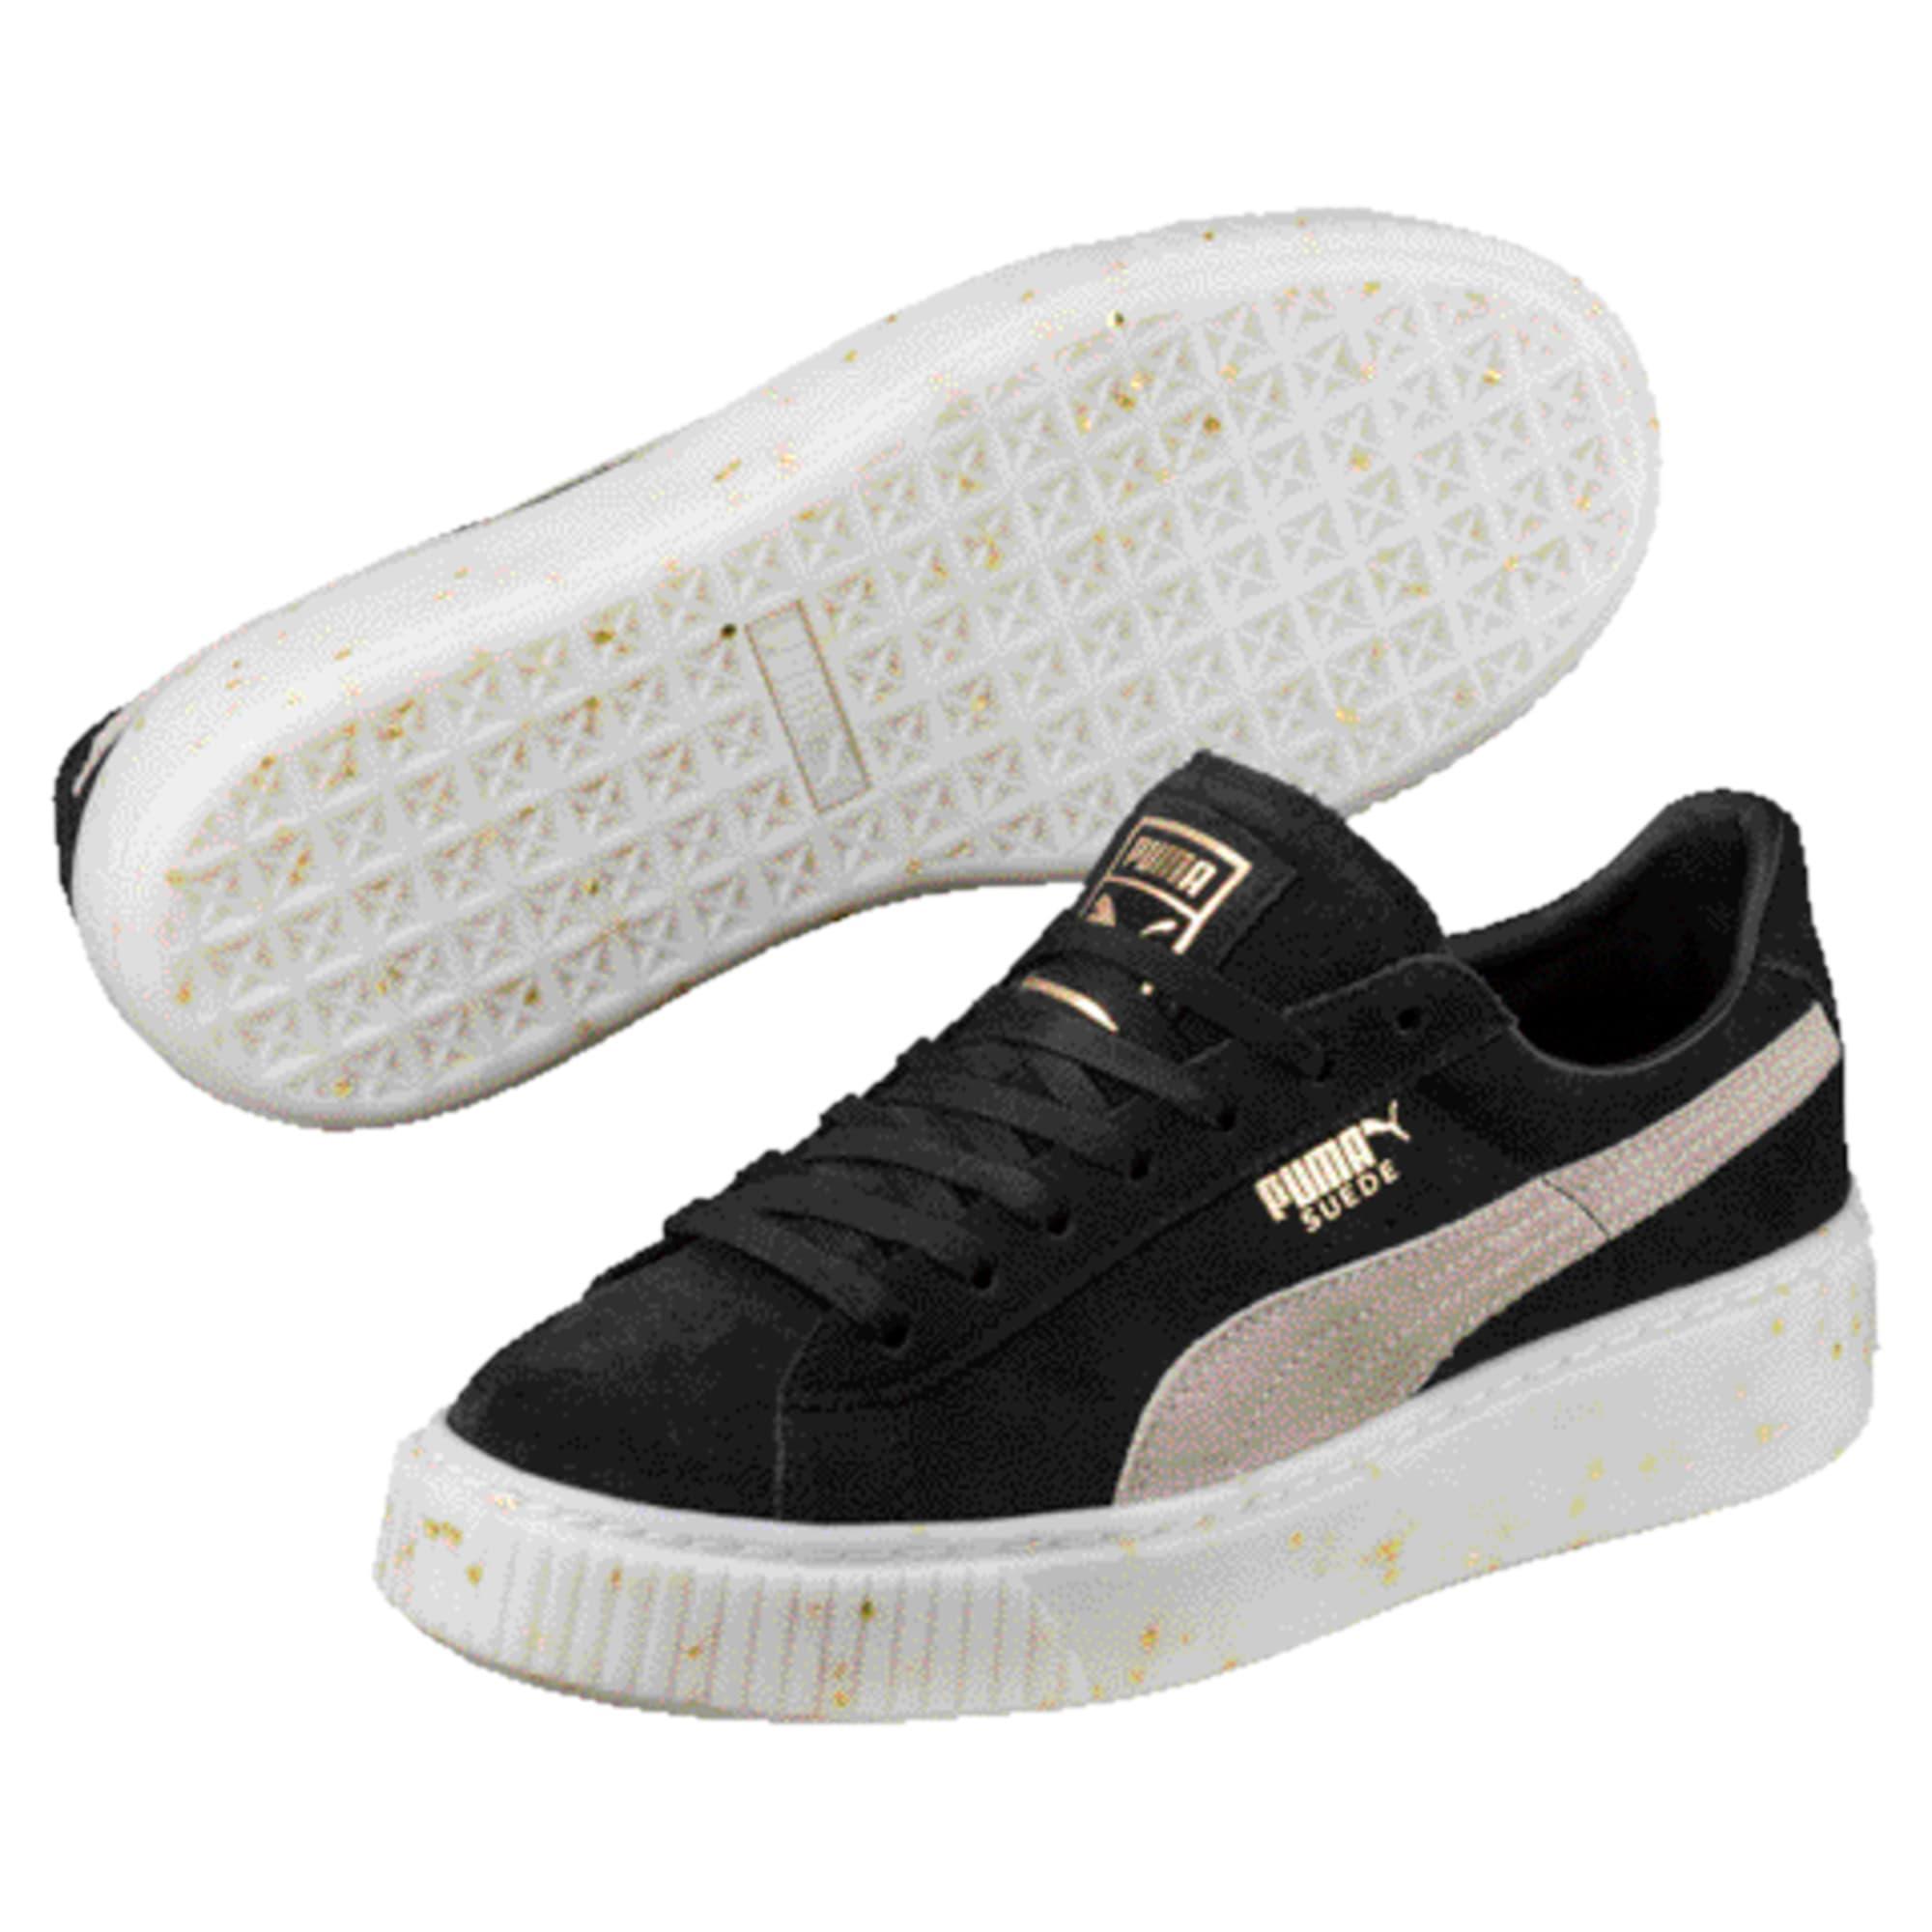 Thumbnail 1 of Suede Platform Celebrate Women's Sneakers, Puma Black-Puma White-Gold, medium